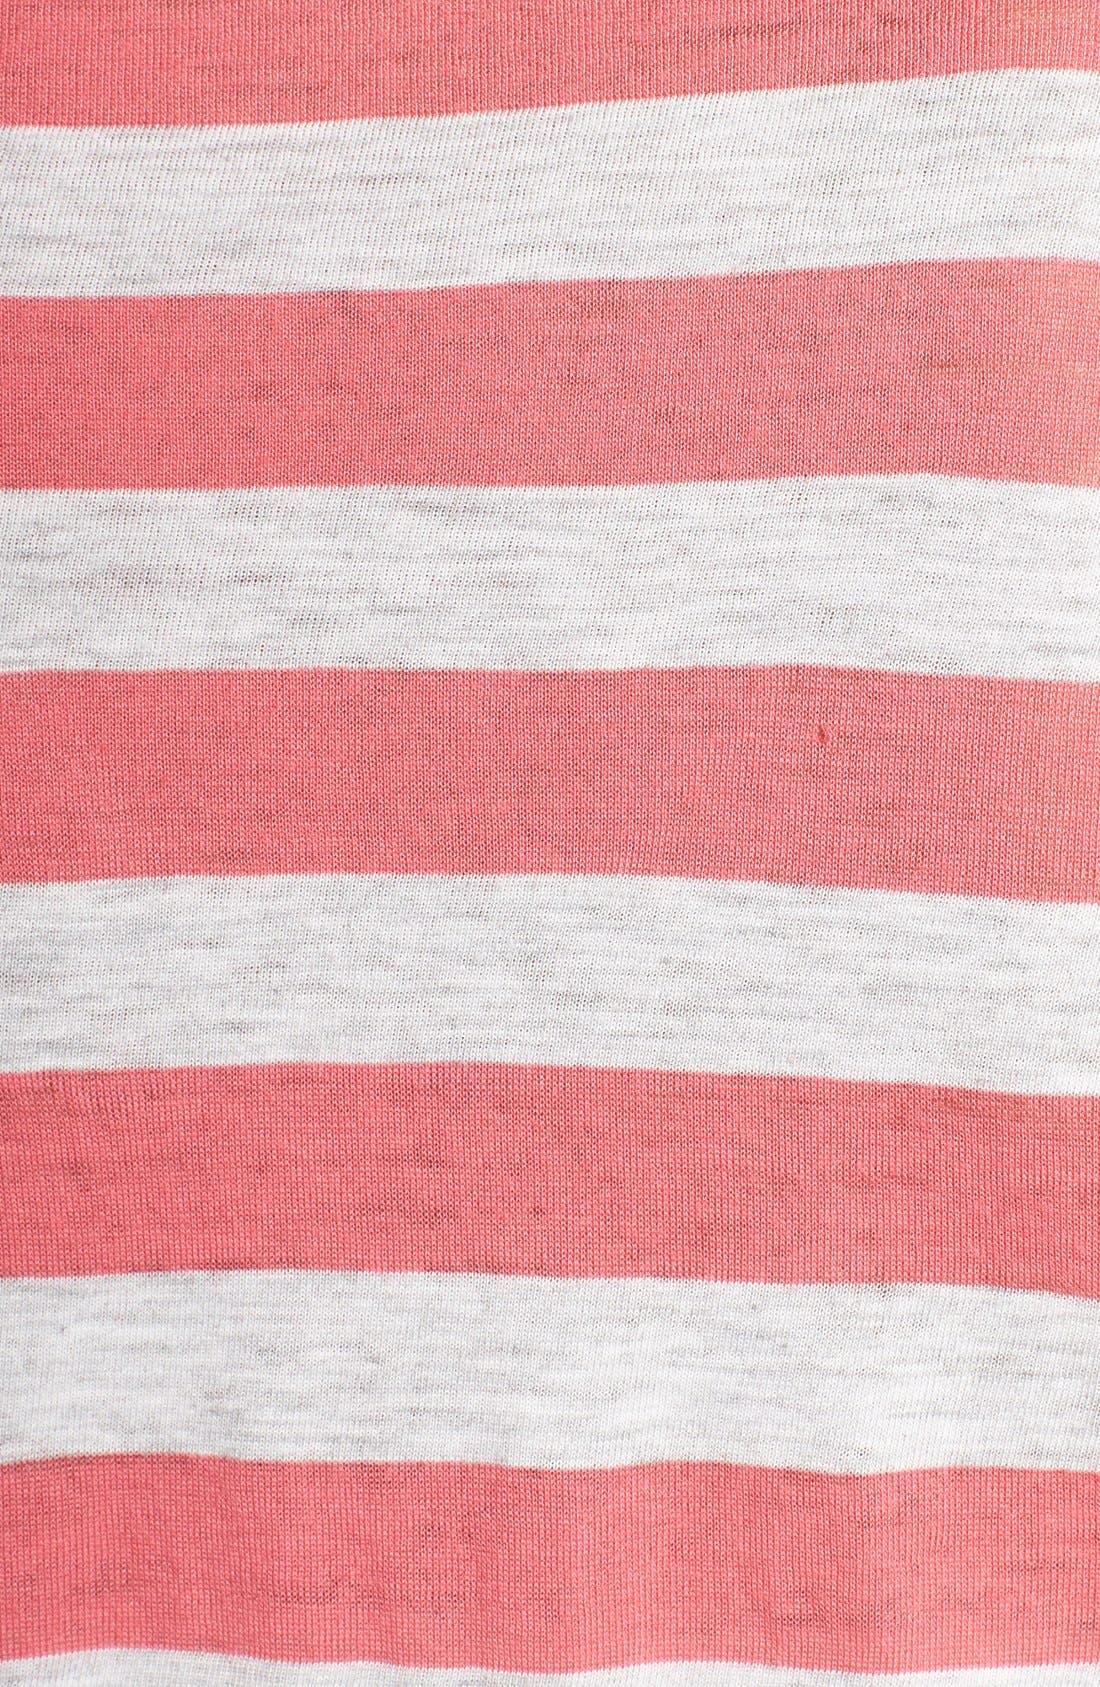 Alternate Image 3  - Nordstrom Print Lightweight Jersey Nightshirt